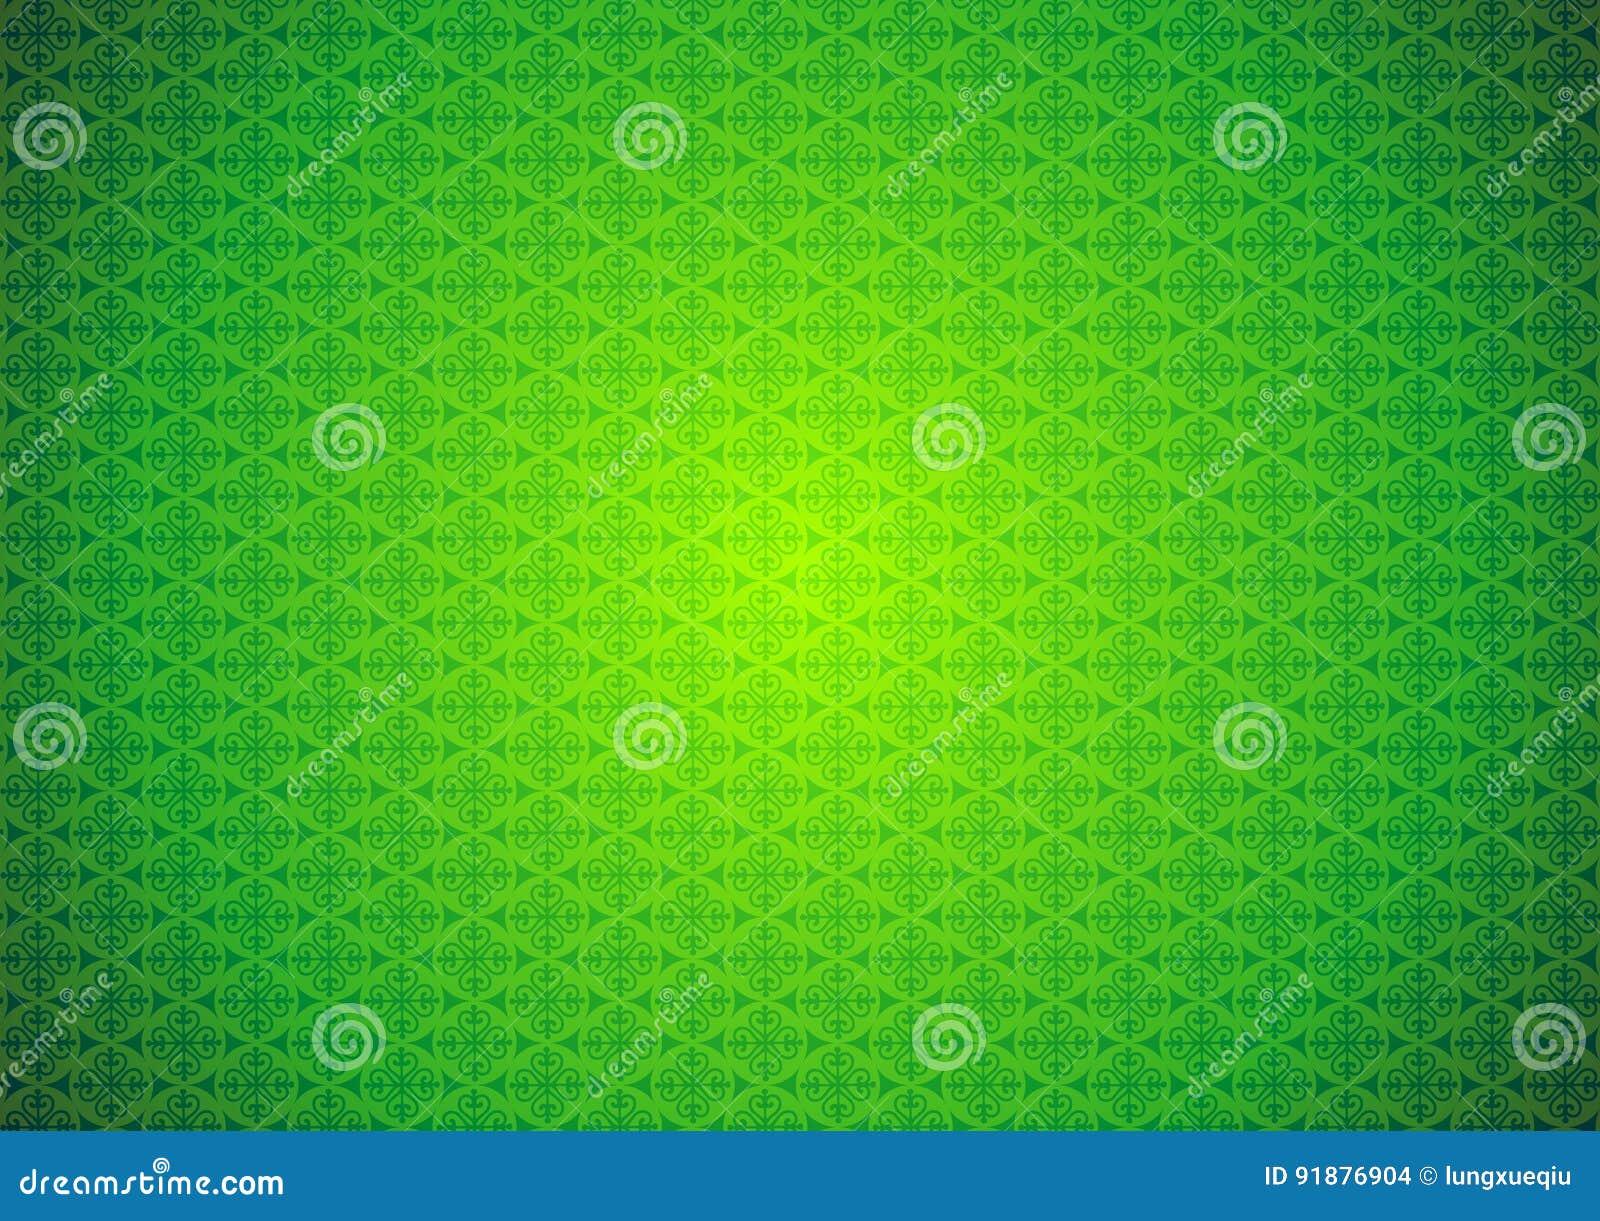 Oriental, Ornamental, Chinese, Arabic, Islamic, Green Pattern Texture Background. Imlek, Ramadan, Festival Wallpaper.